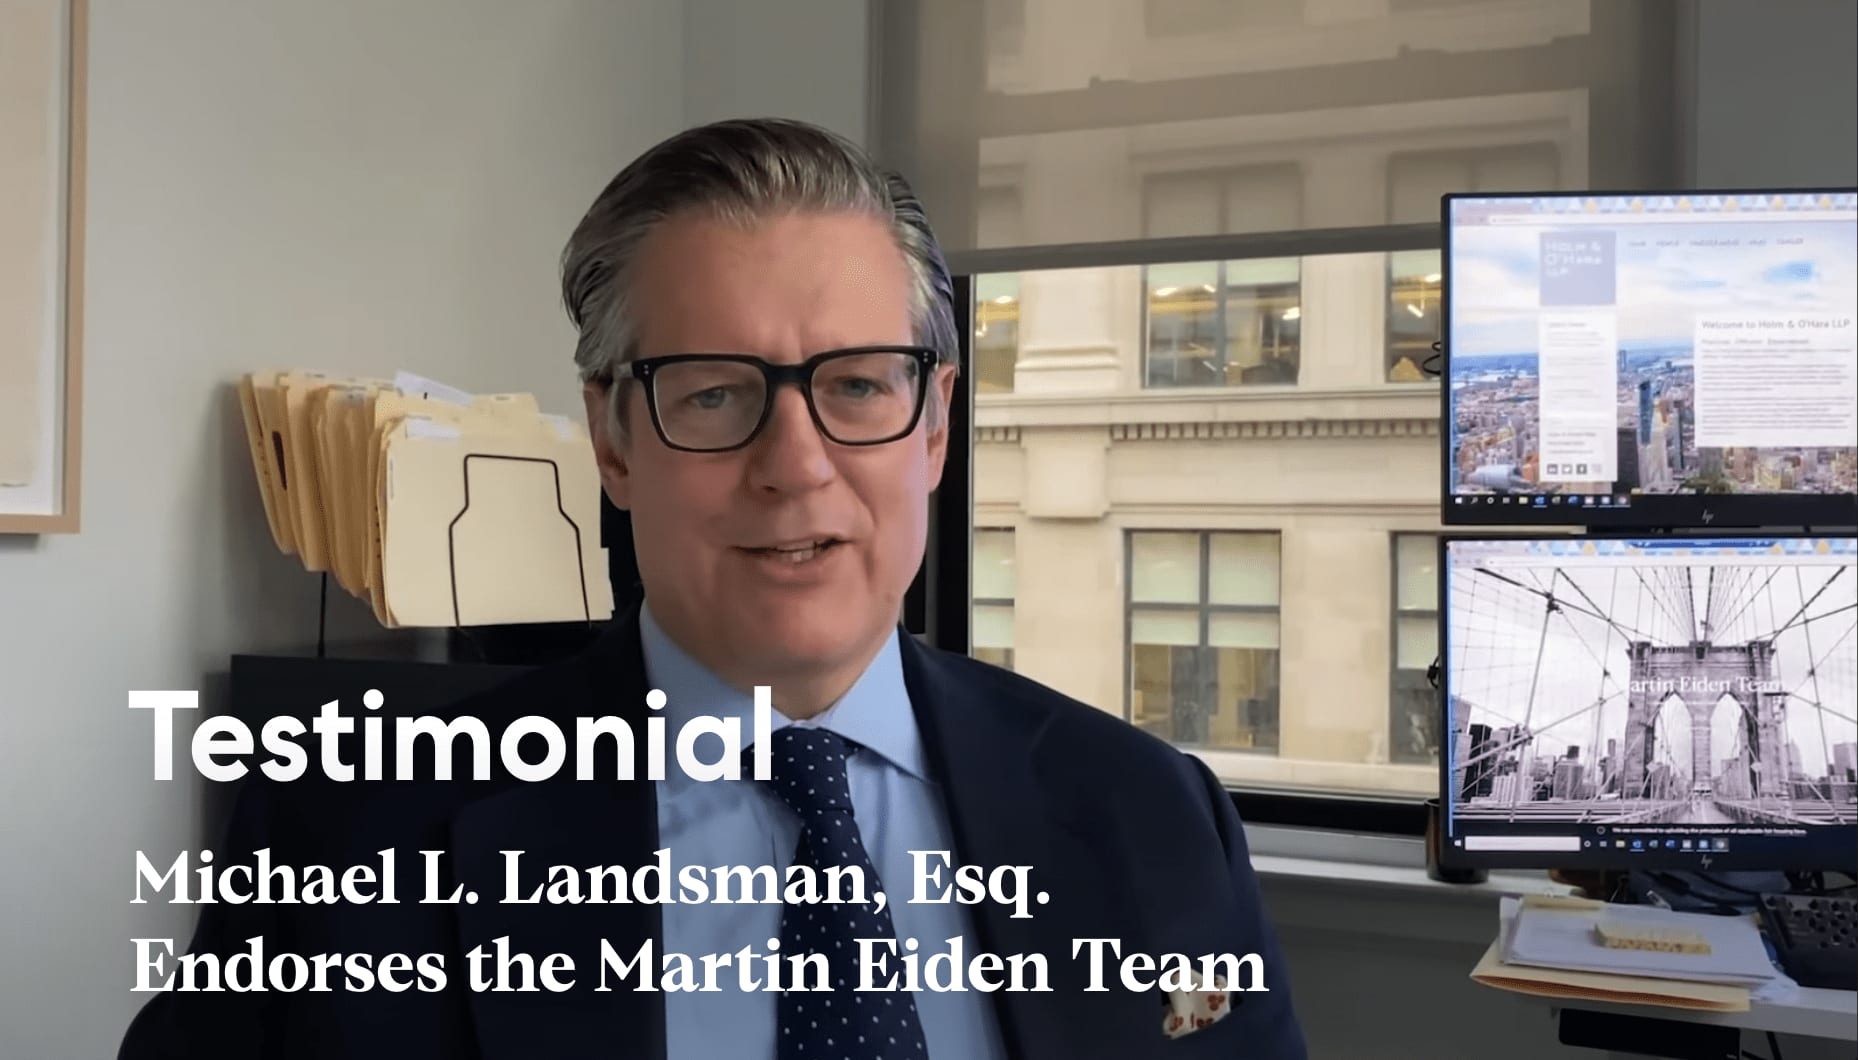 Michael L. Landsman, Esq. Endorses the Martin Eiden Team video preview